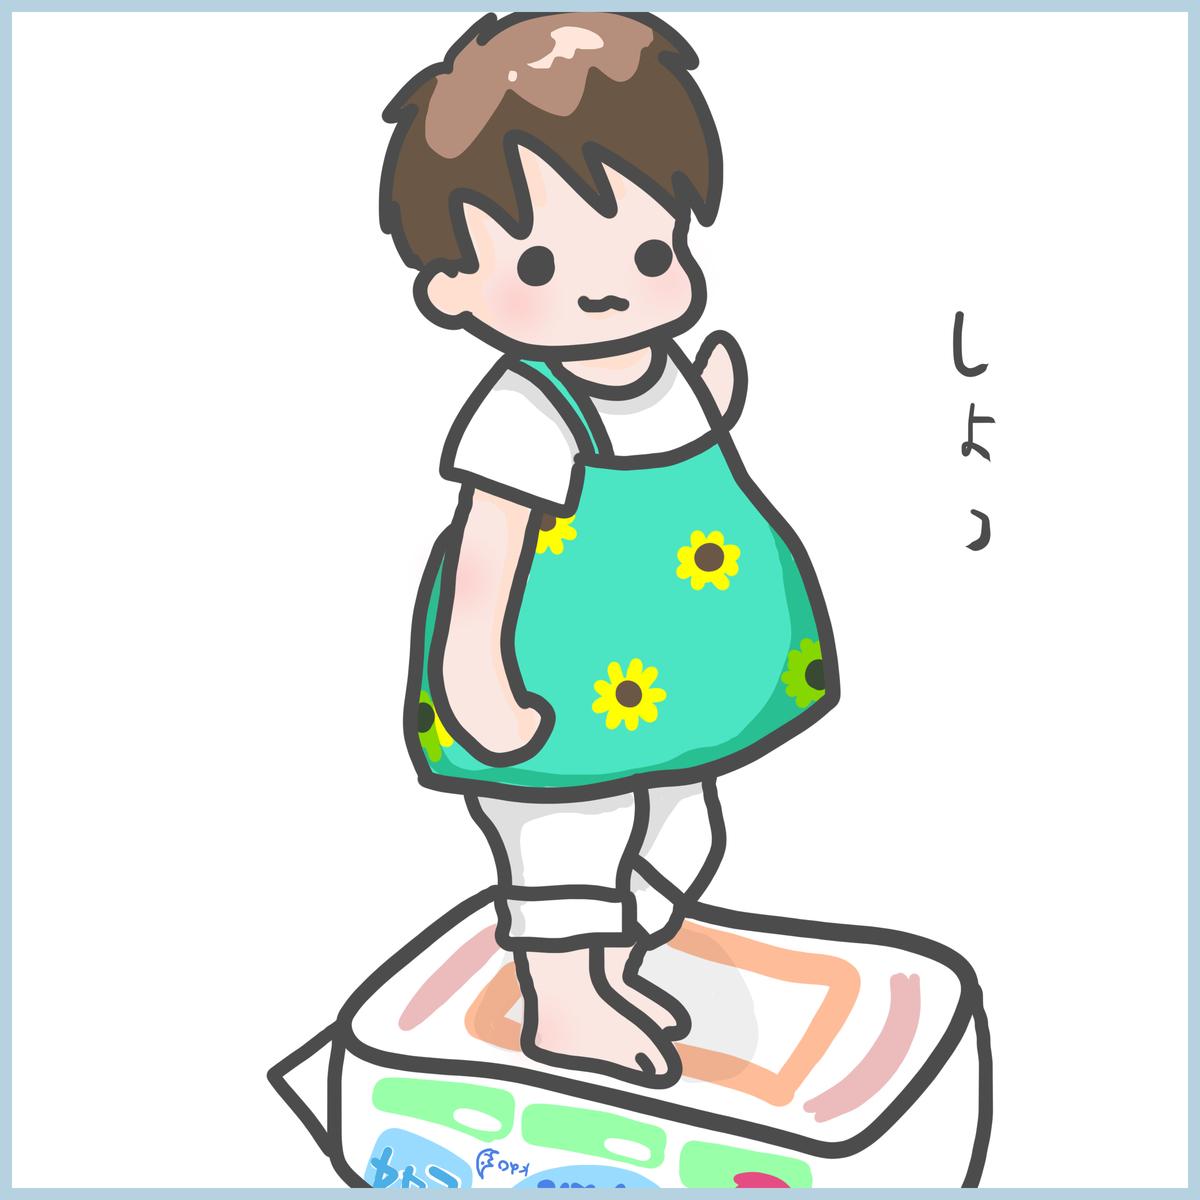 f:id:ika_yoshi:20201102232859j:plain